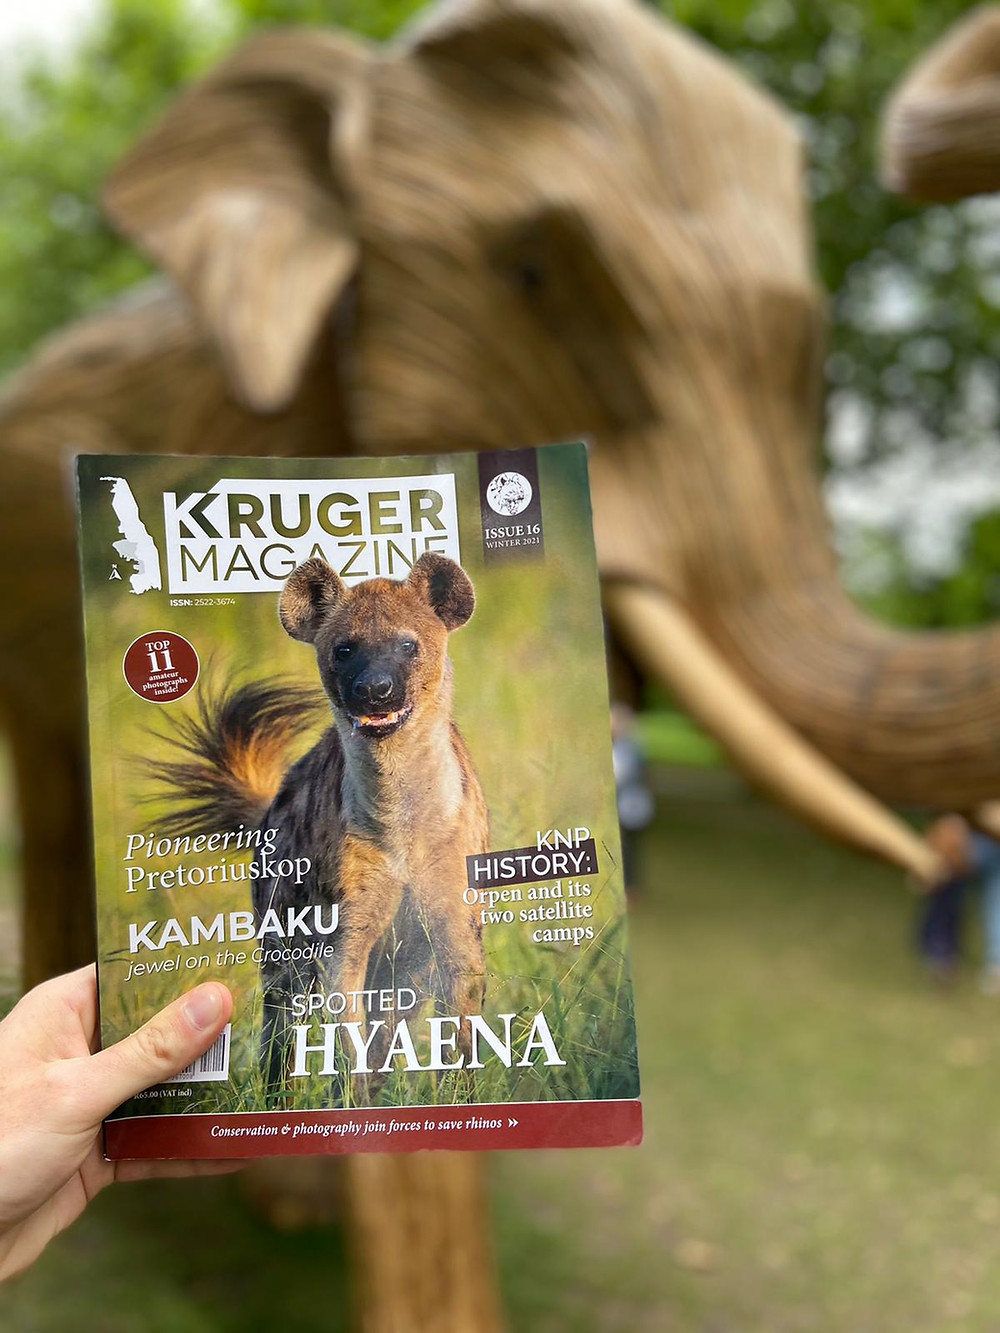 Kruger Magazine in London